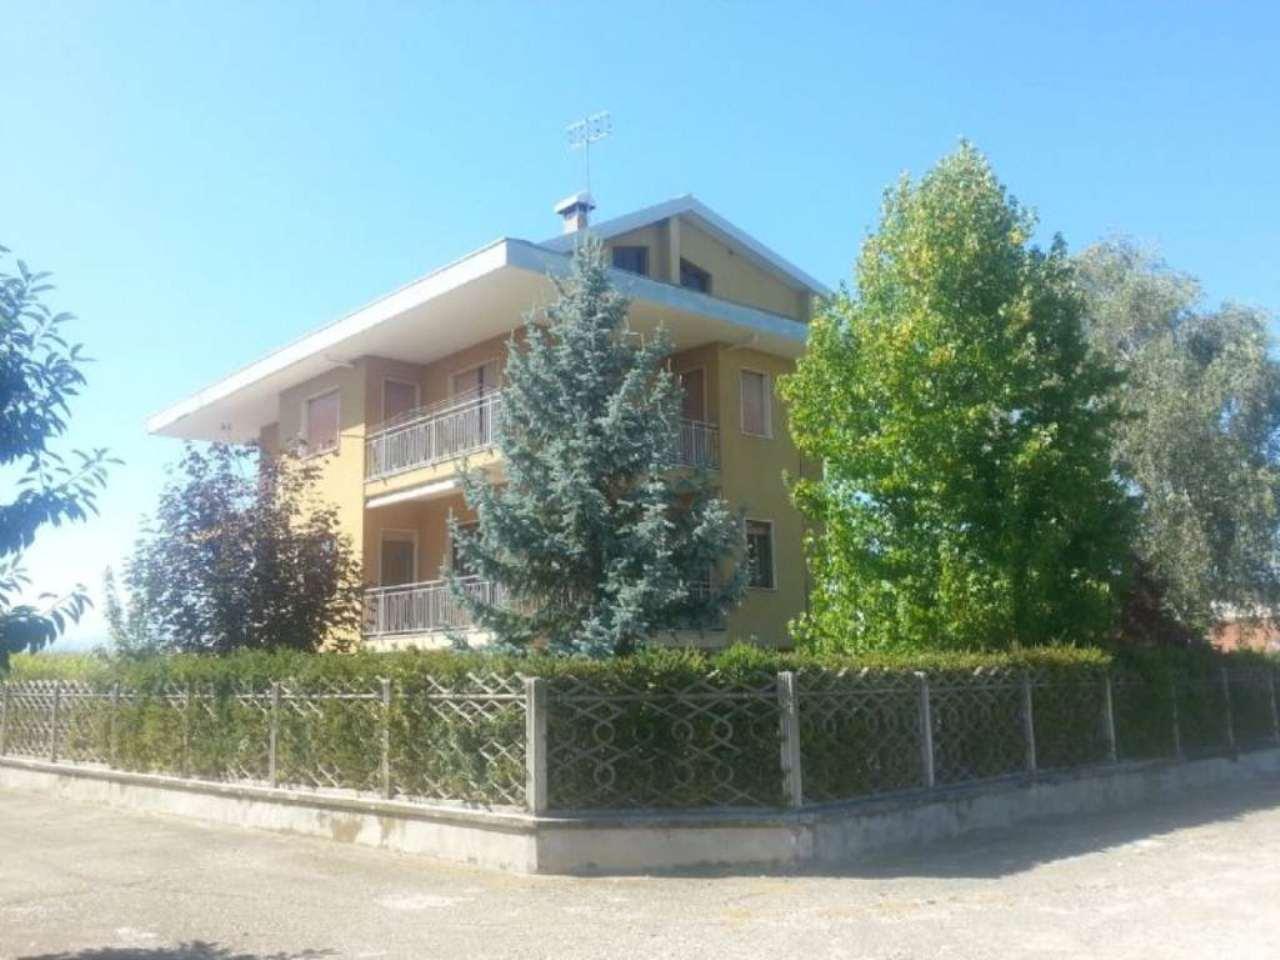 Soluzione Indipendente in vendita a Cuneo, 8 locali, Trattative riservate | Cambio Casa.it